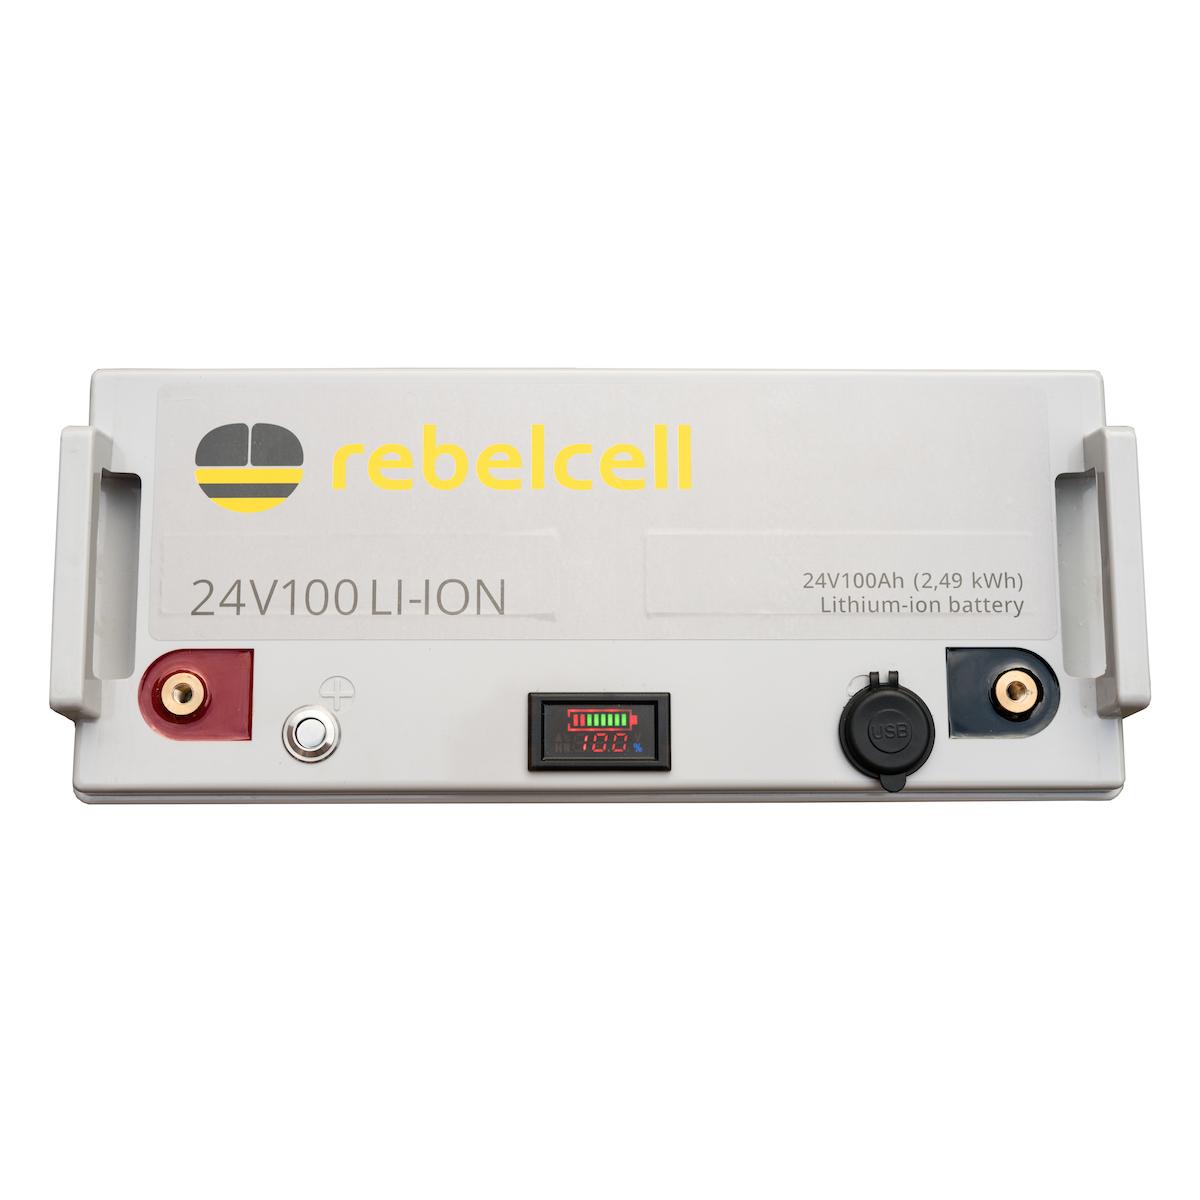 24V100 li-ion batteri (2,49 kWh)